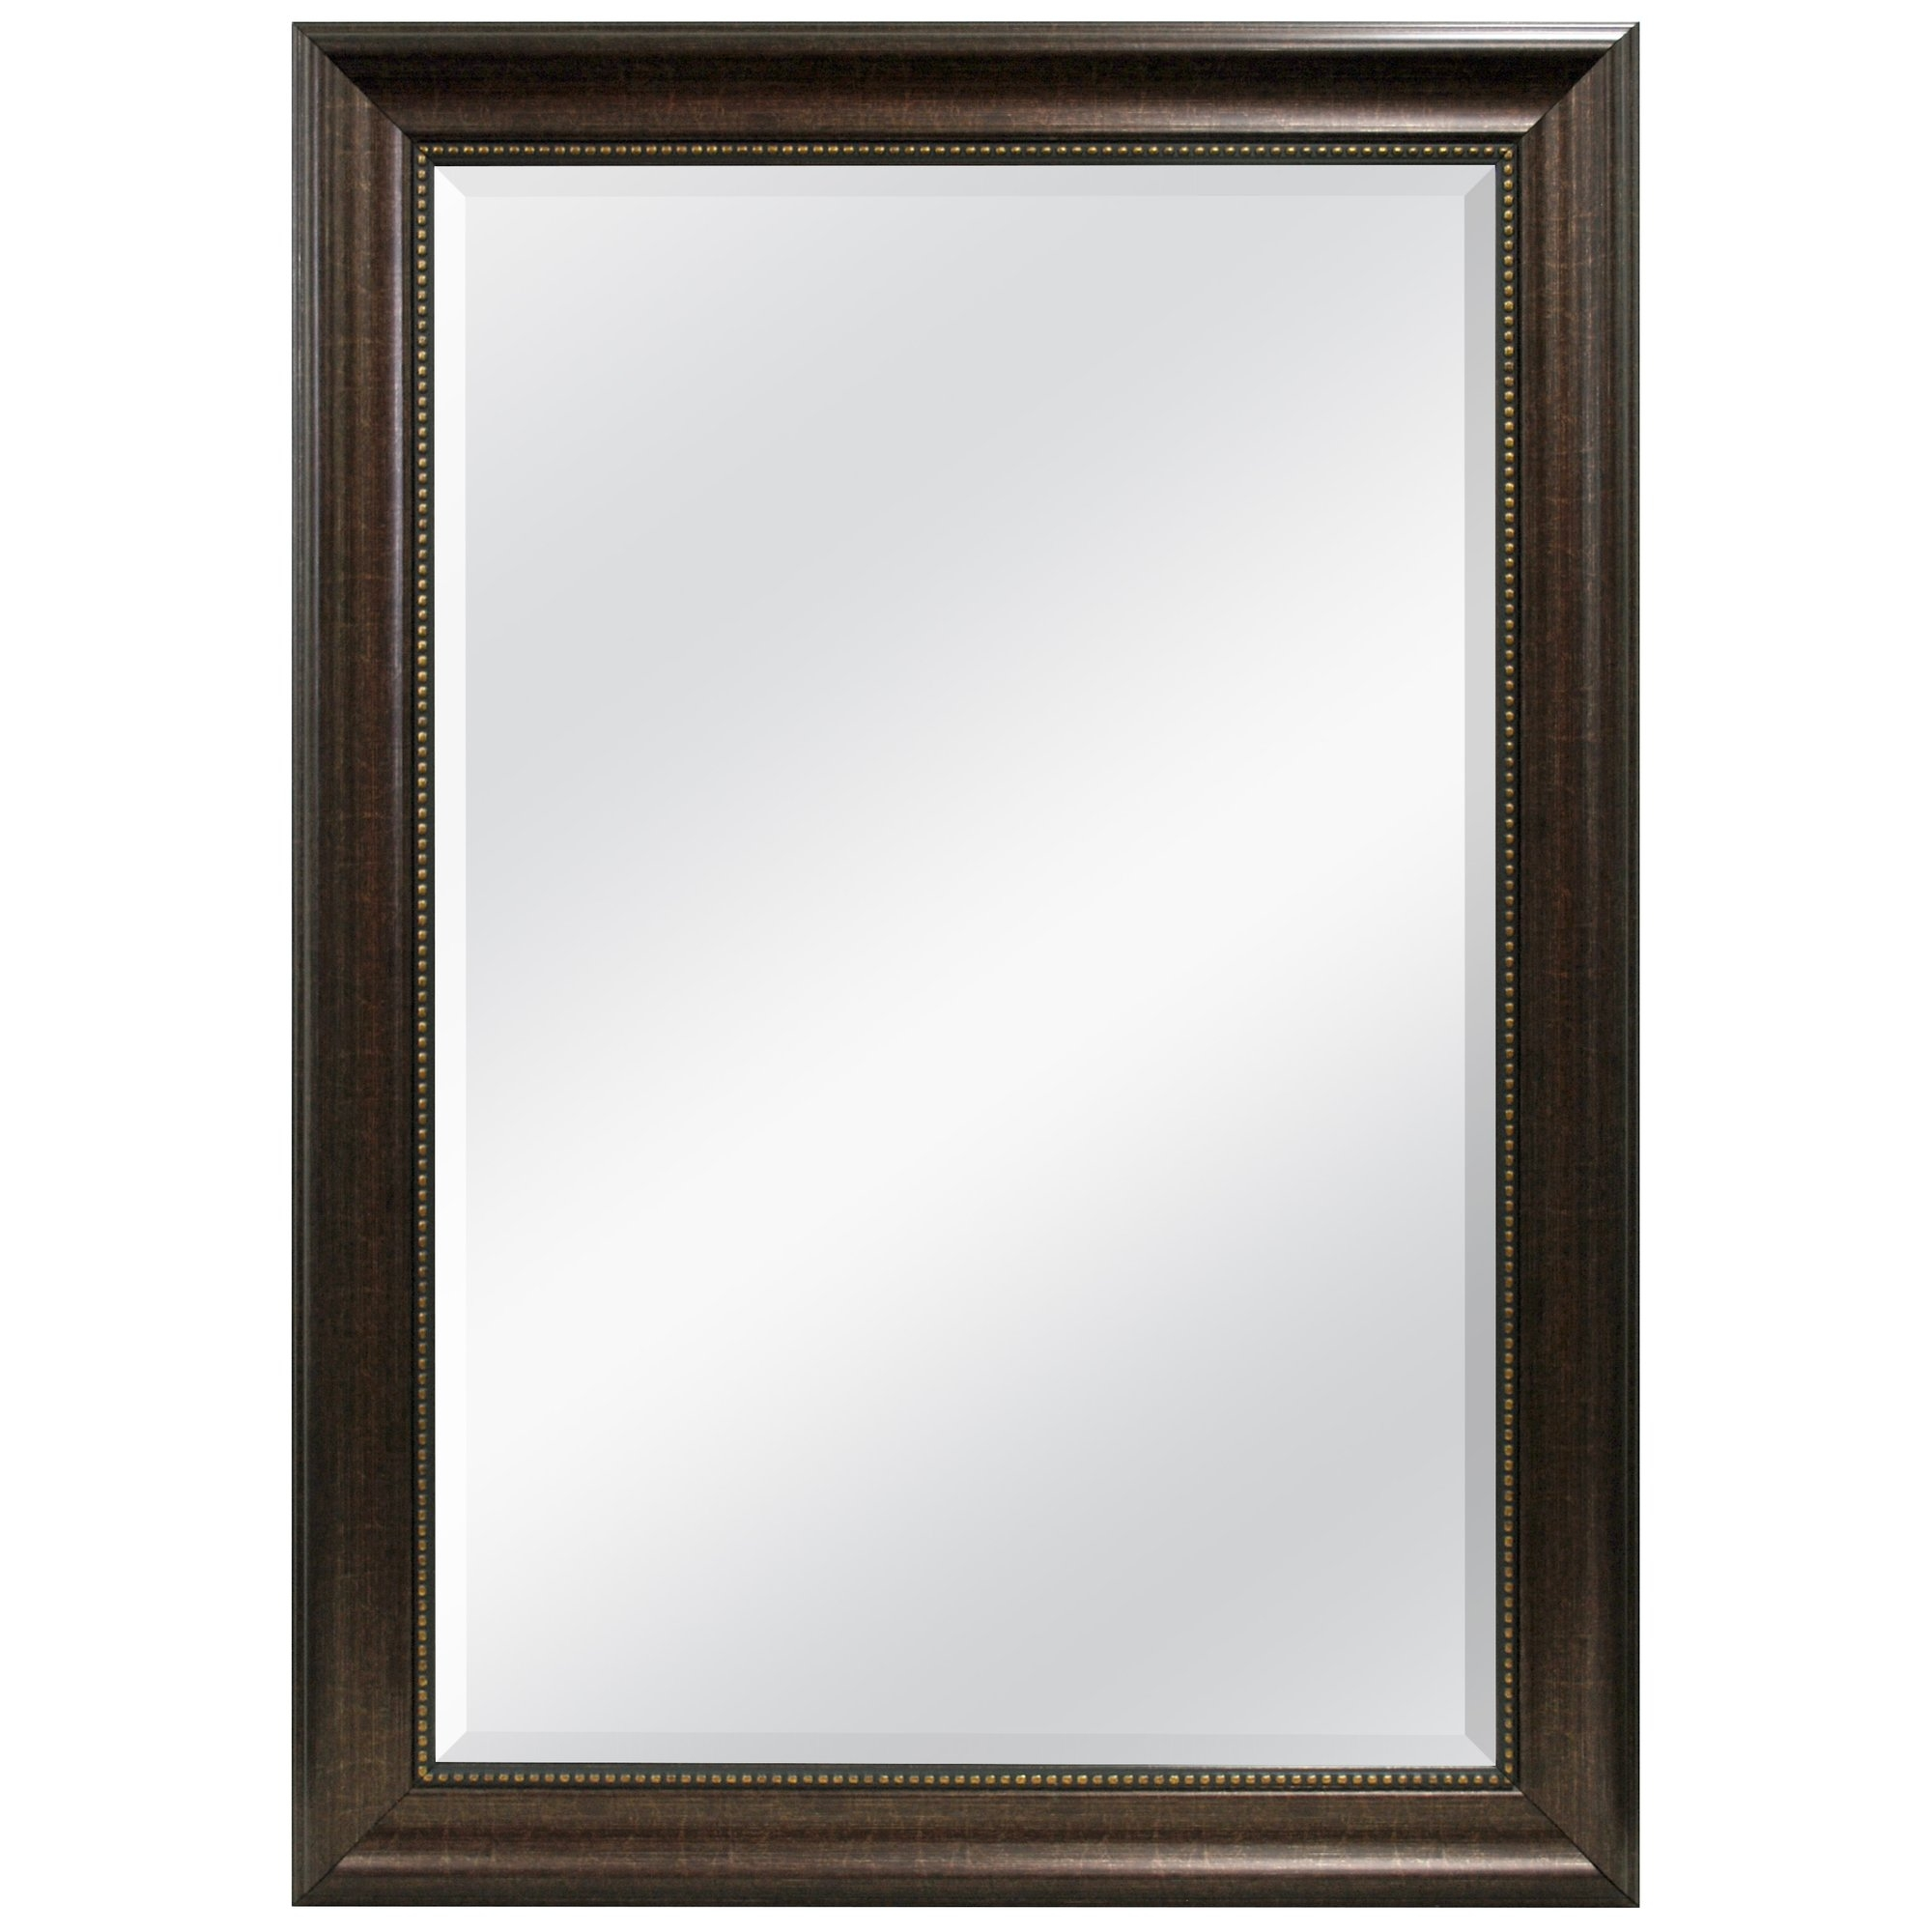 Three Posts Beaded Bronze Beveled Wall Mirror Reviews Wayfair Pertaining To Bronze Wall Mirrors (View 3 of 15)